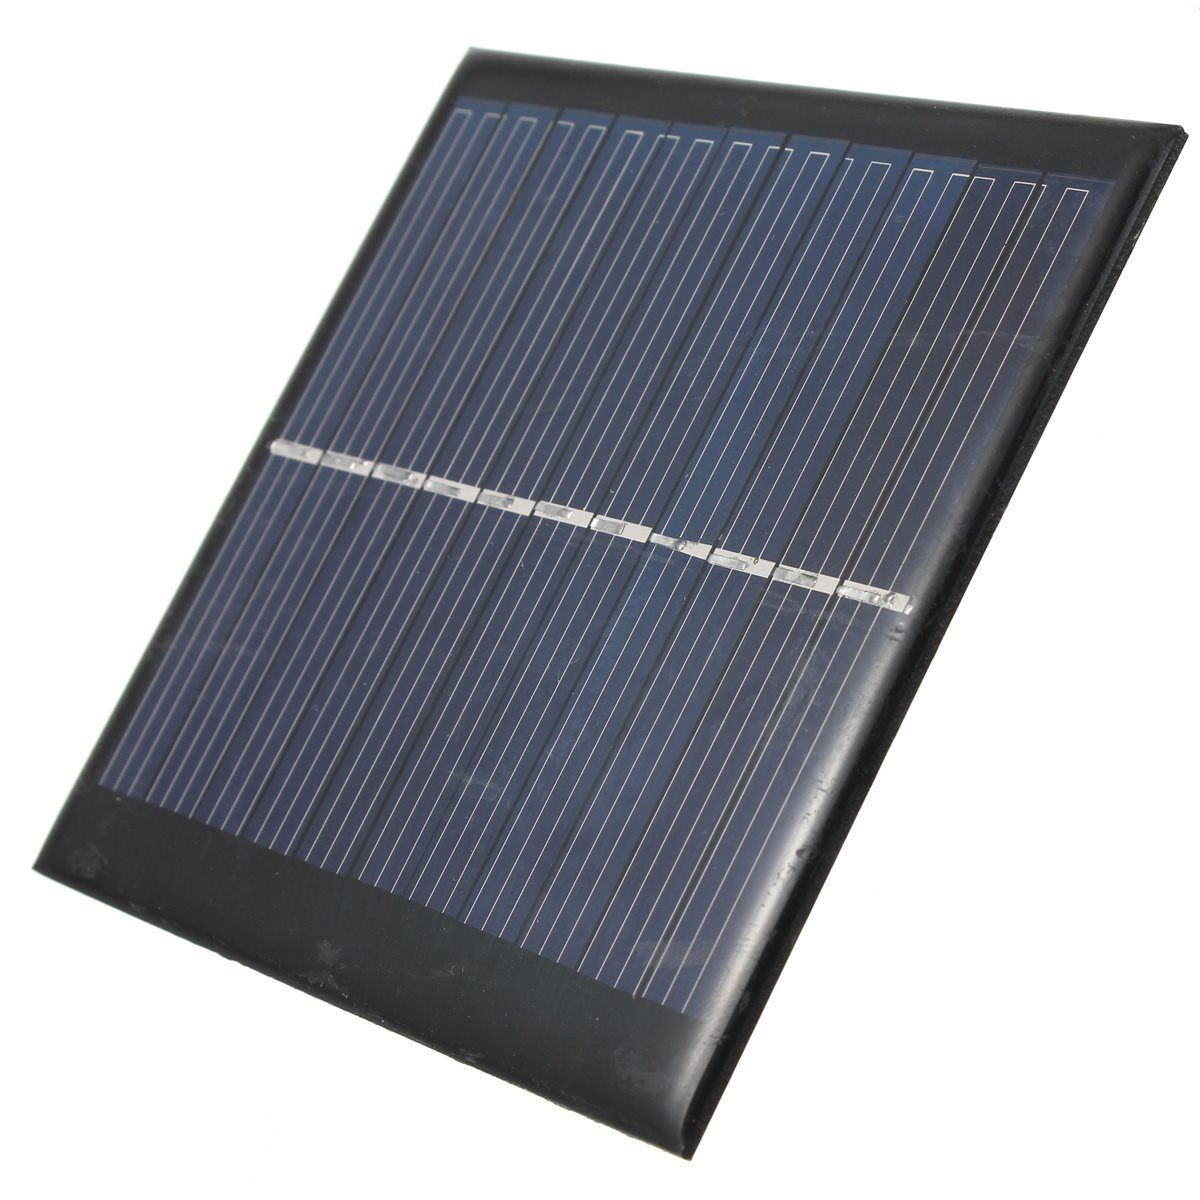 Hohe qualität Universal 5,5 V 1 Watt 180mA Polykristallines Silizium Solar-panel-modul DIY Ladegerät für Lade Handys DC Batterie